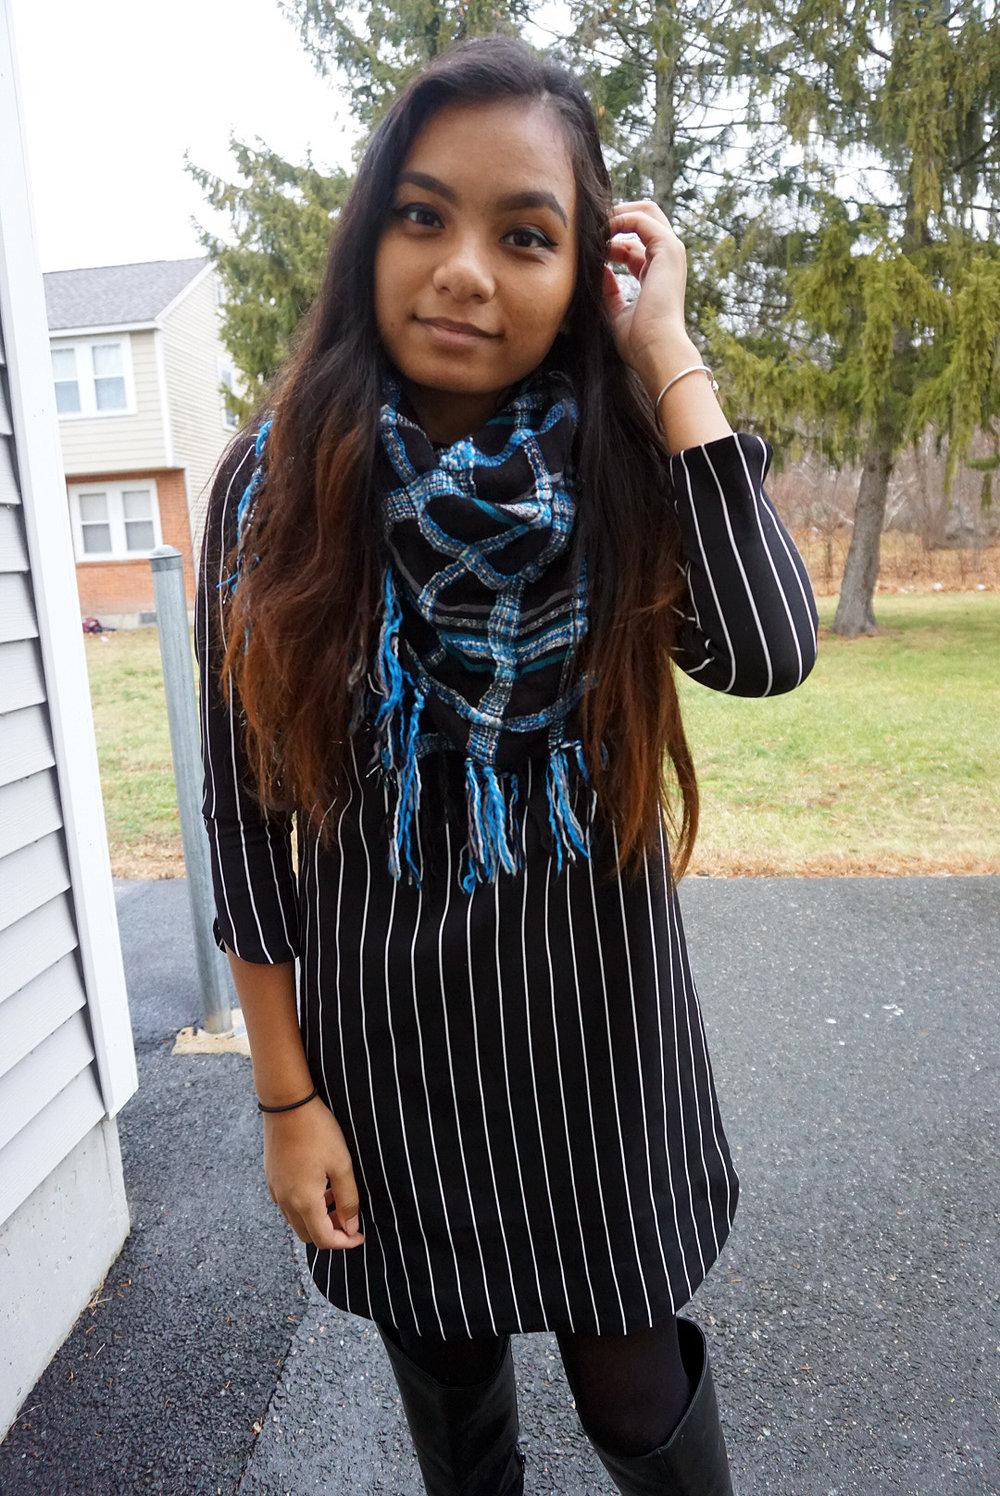 Black-White-Striped-Dress-Blogger-Style-LINDATENCHITRAN-13-1080x1616.jpg